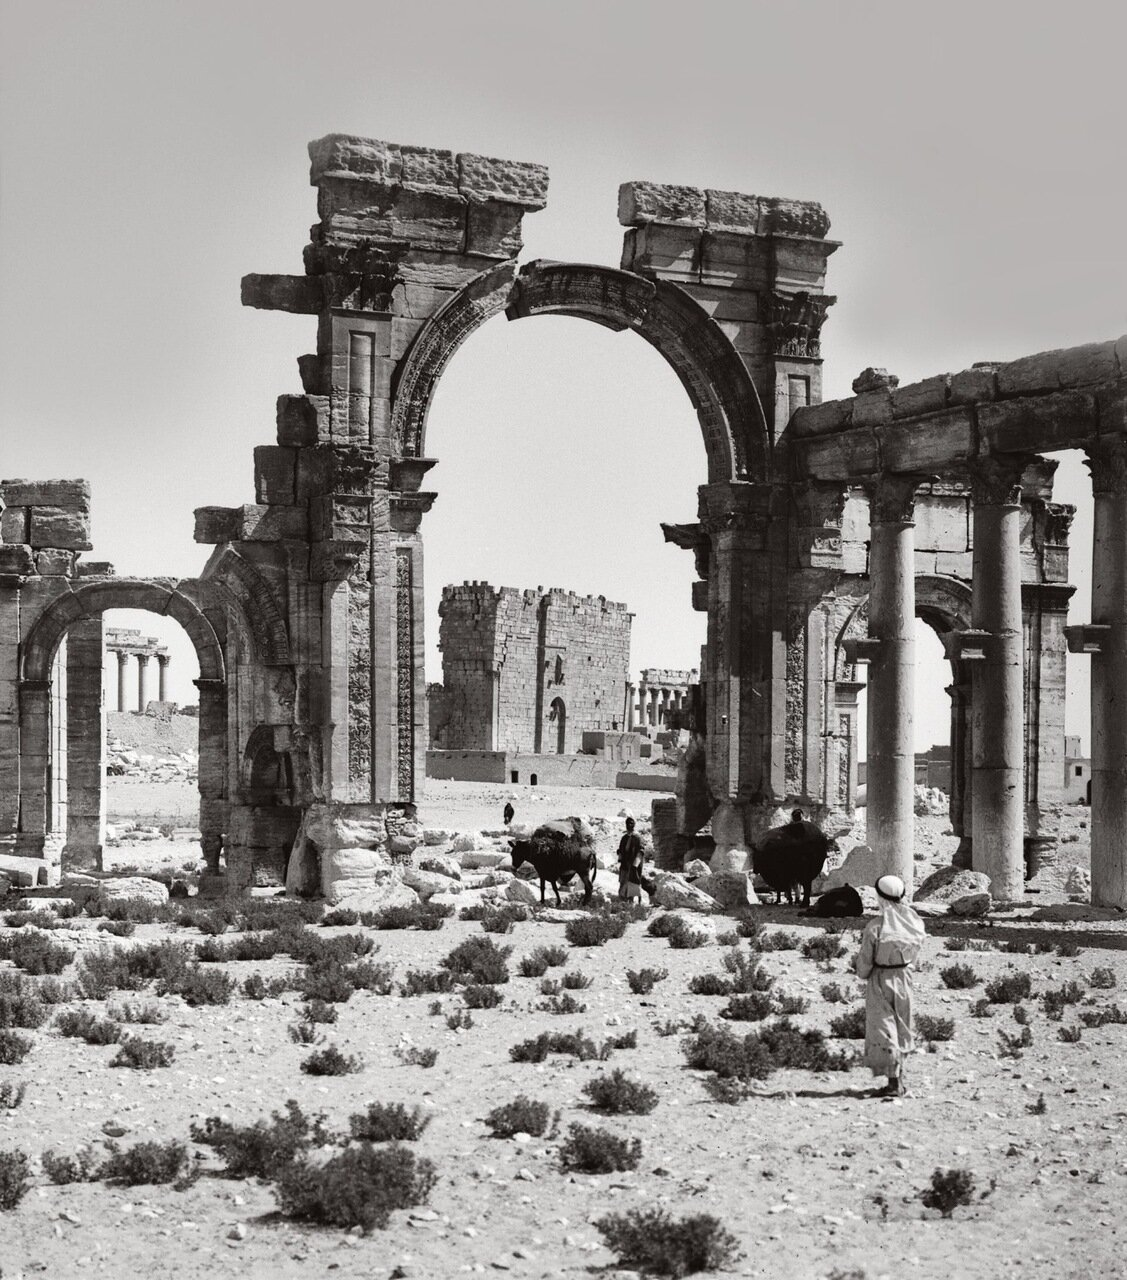 Триумфальная арка у входа в колоннаду. Пальмира. Тадмор, Сирия. 1900-1920 гг.